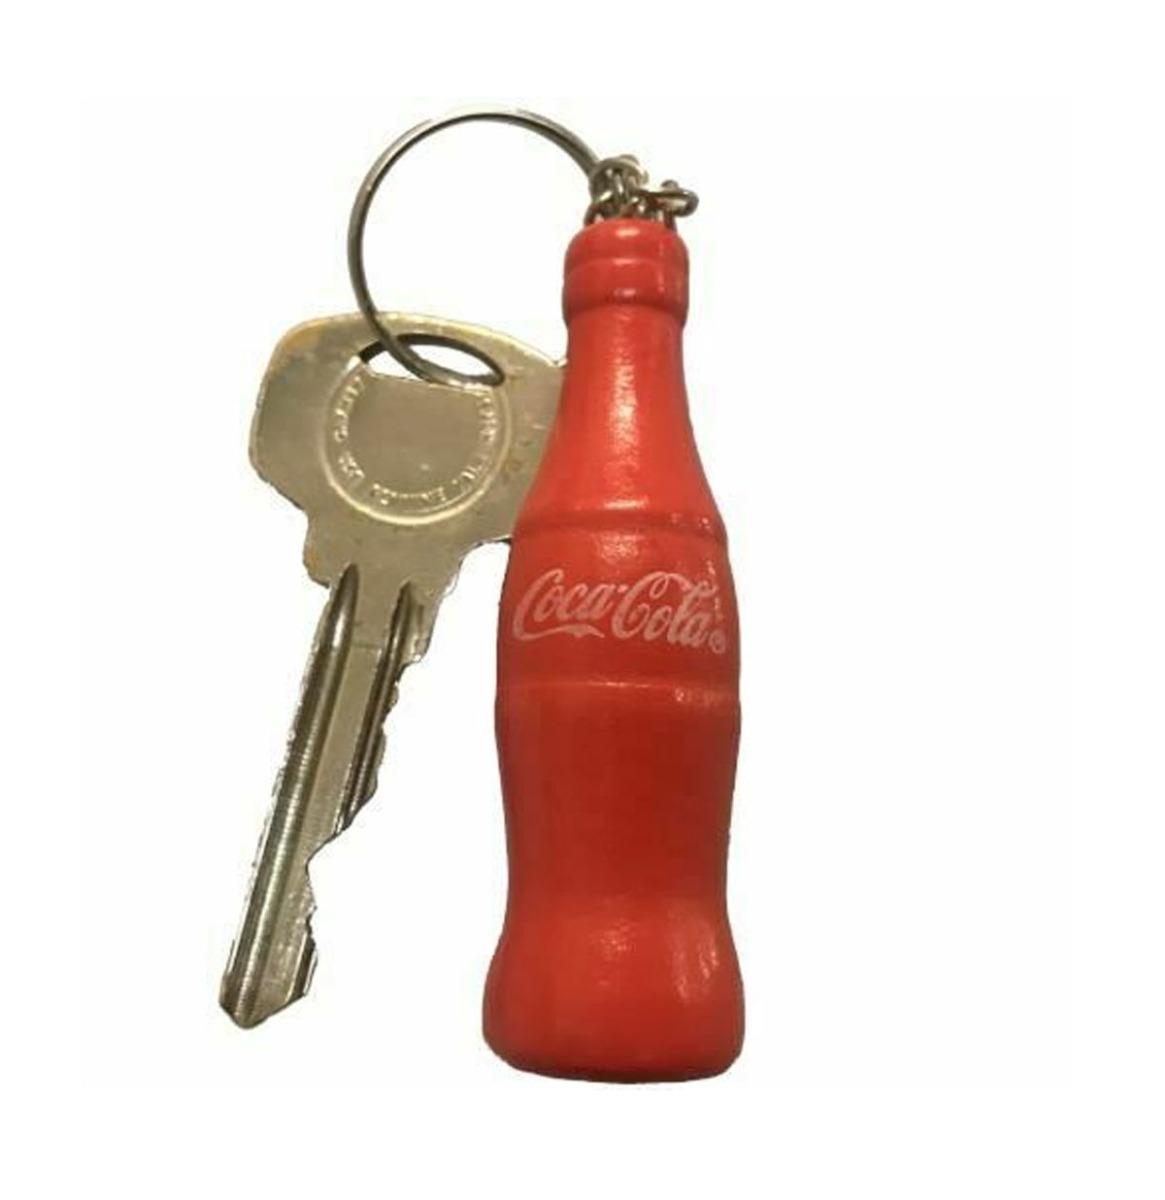 Classic Coca-Cola Fles Houten Sleutelhanger - Rood